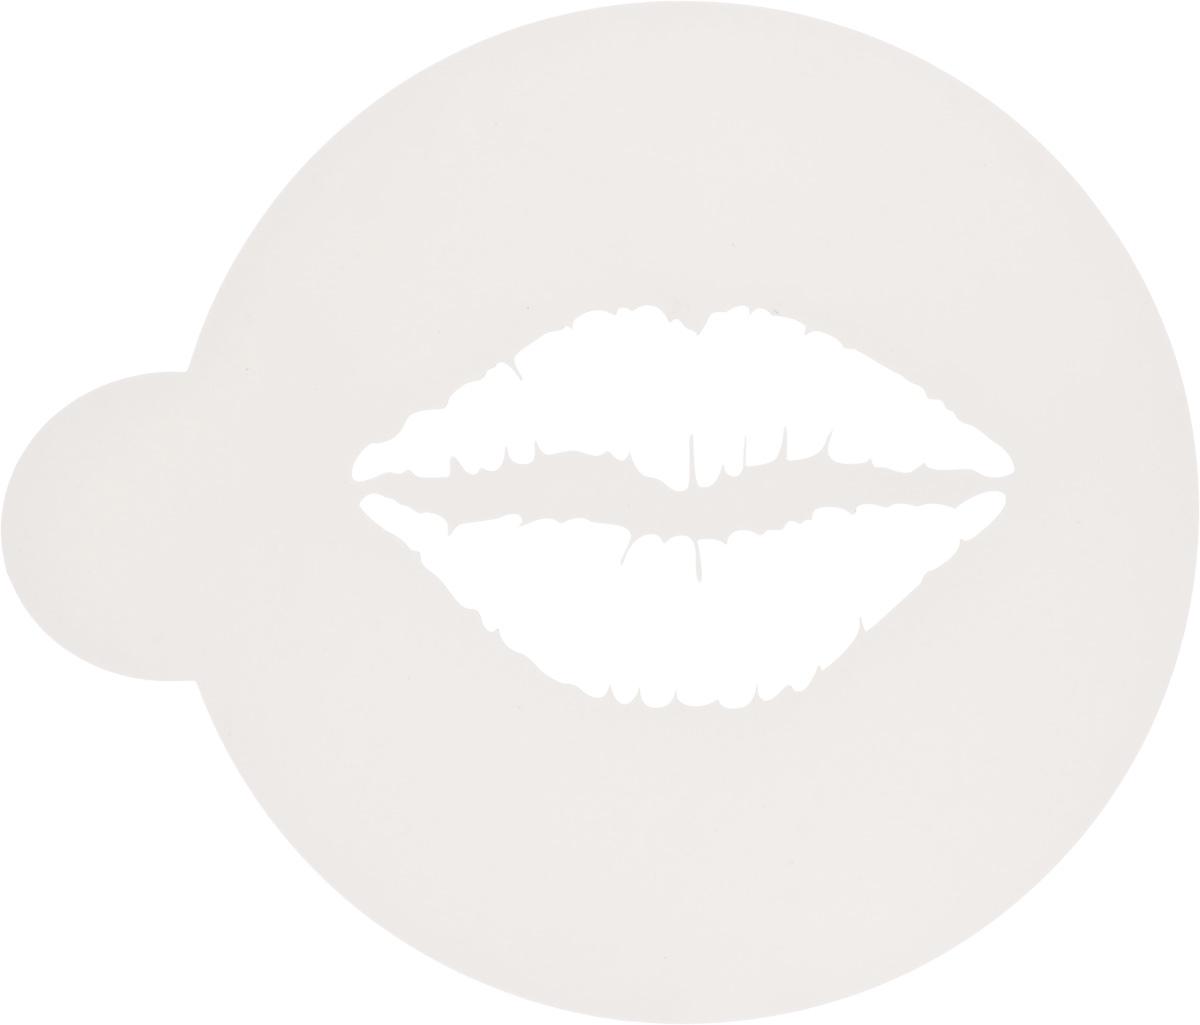 Трафарет на кофе и десерты Леденцовая фабрика Поцелуй, диаметр 10 см трафарет на кофе и десерты леденцовая фабрика кошка с рыбой диаметр 10 см